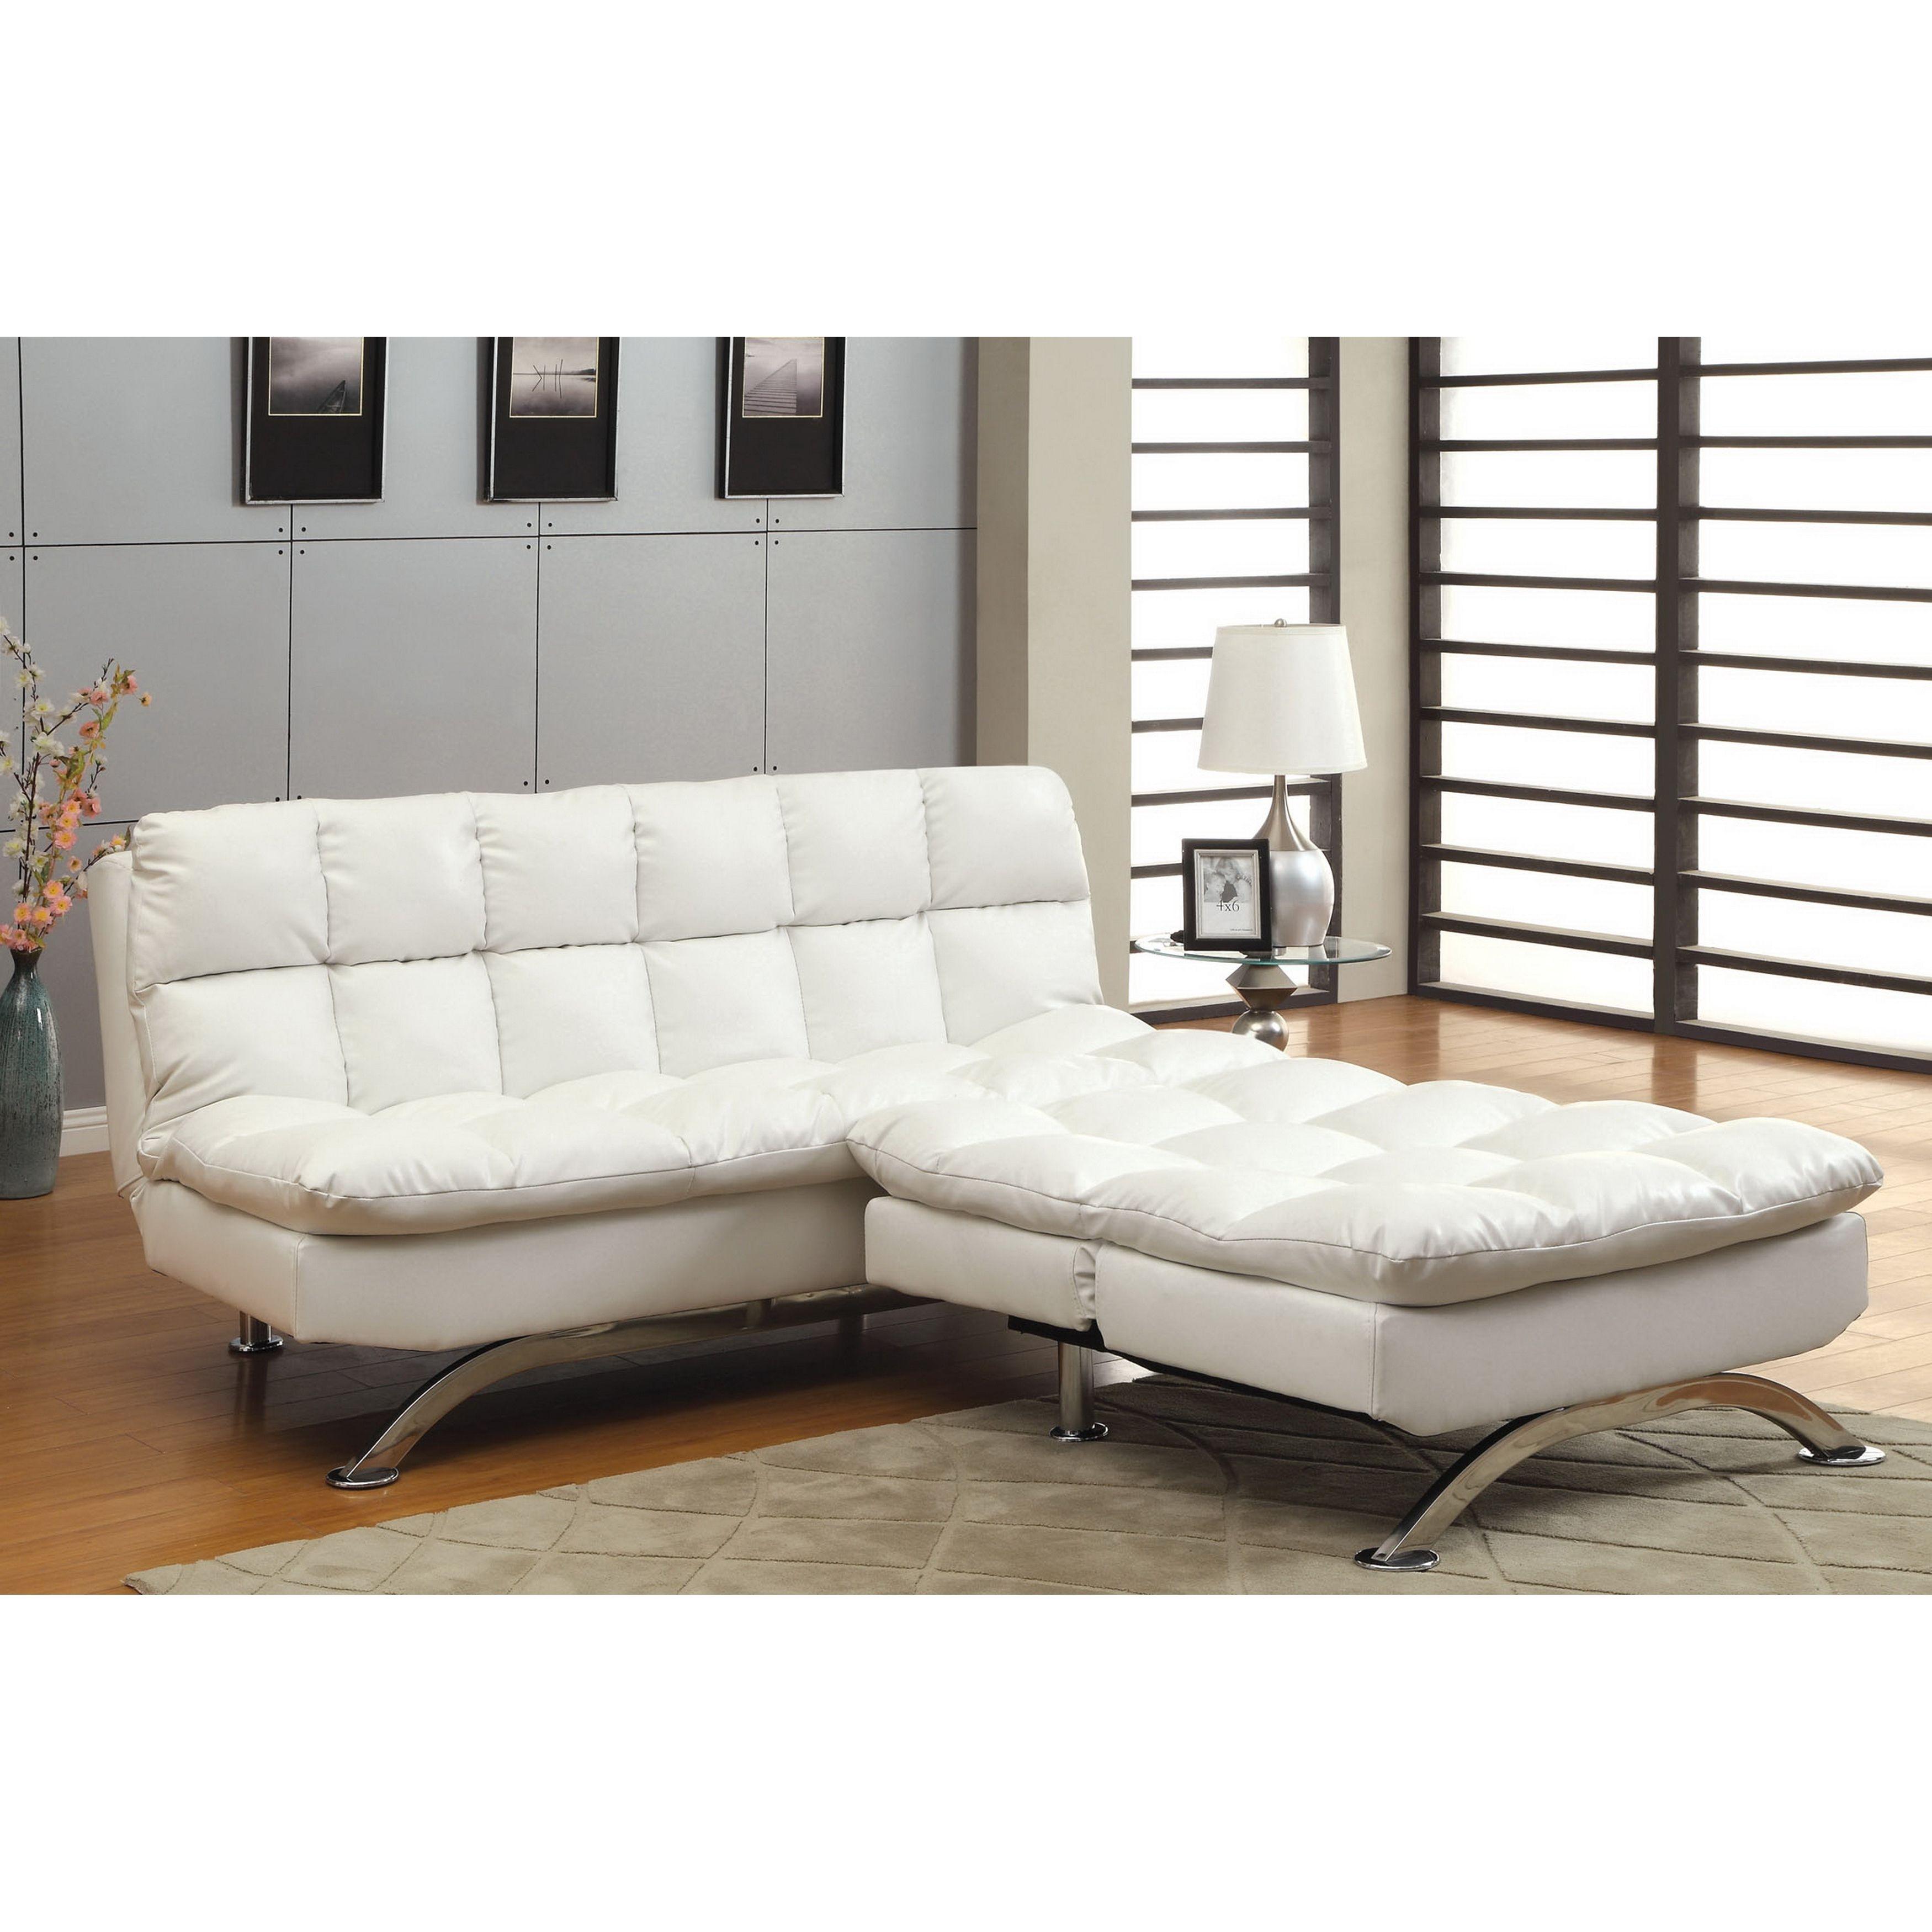 Futon Sofa Home Decor Furniture Modern Tufted Jamaica Convertible Regarding Jamaica Sectional Sofas (View 10 of 10)